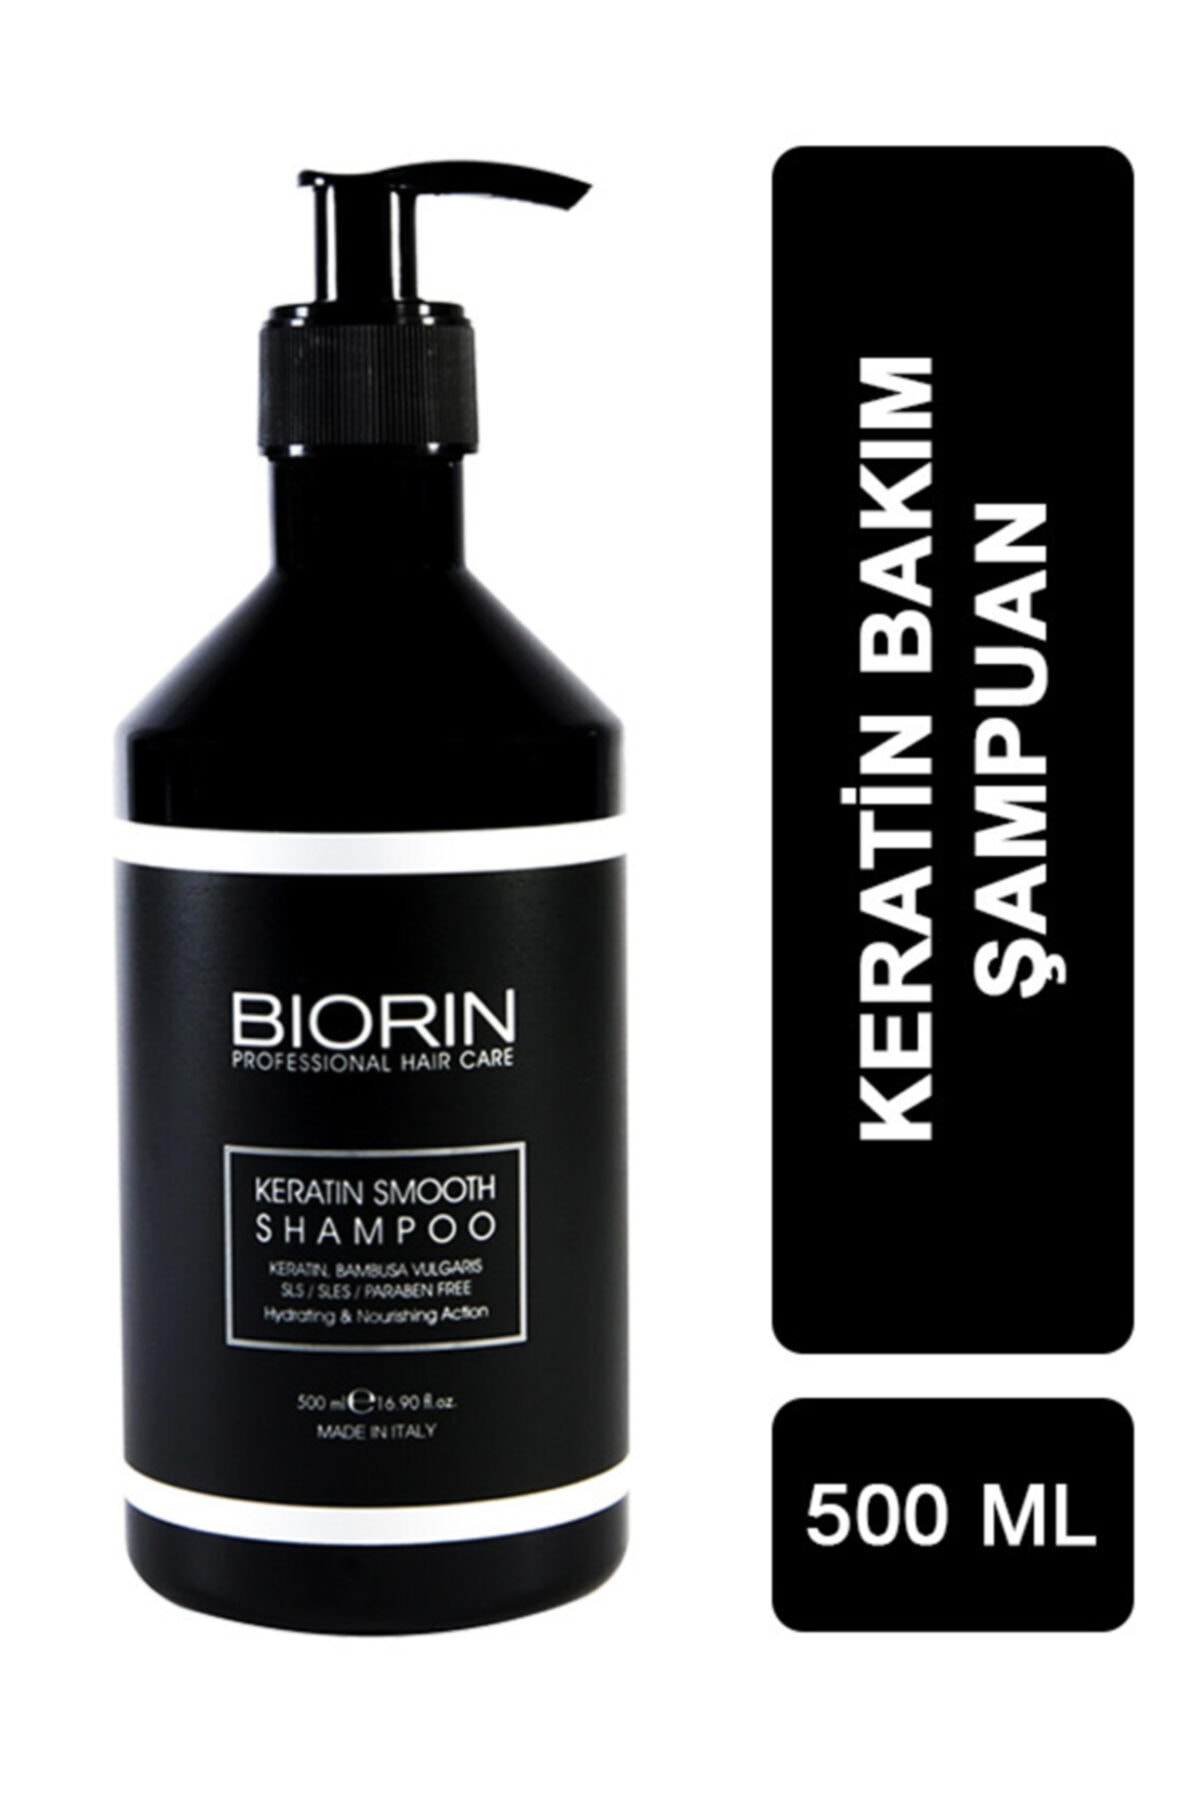 Biorin Keratin Smooth Shampoo 500 Ml 1